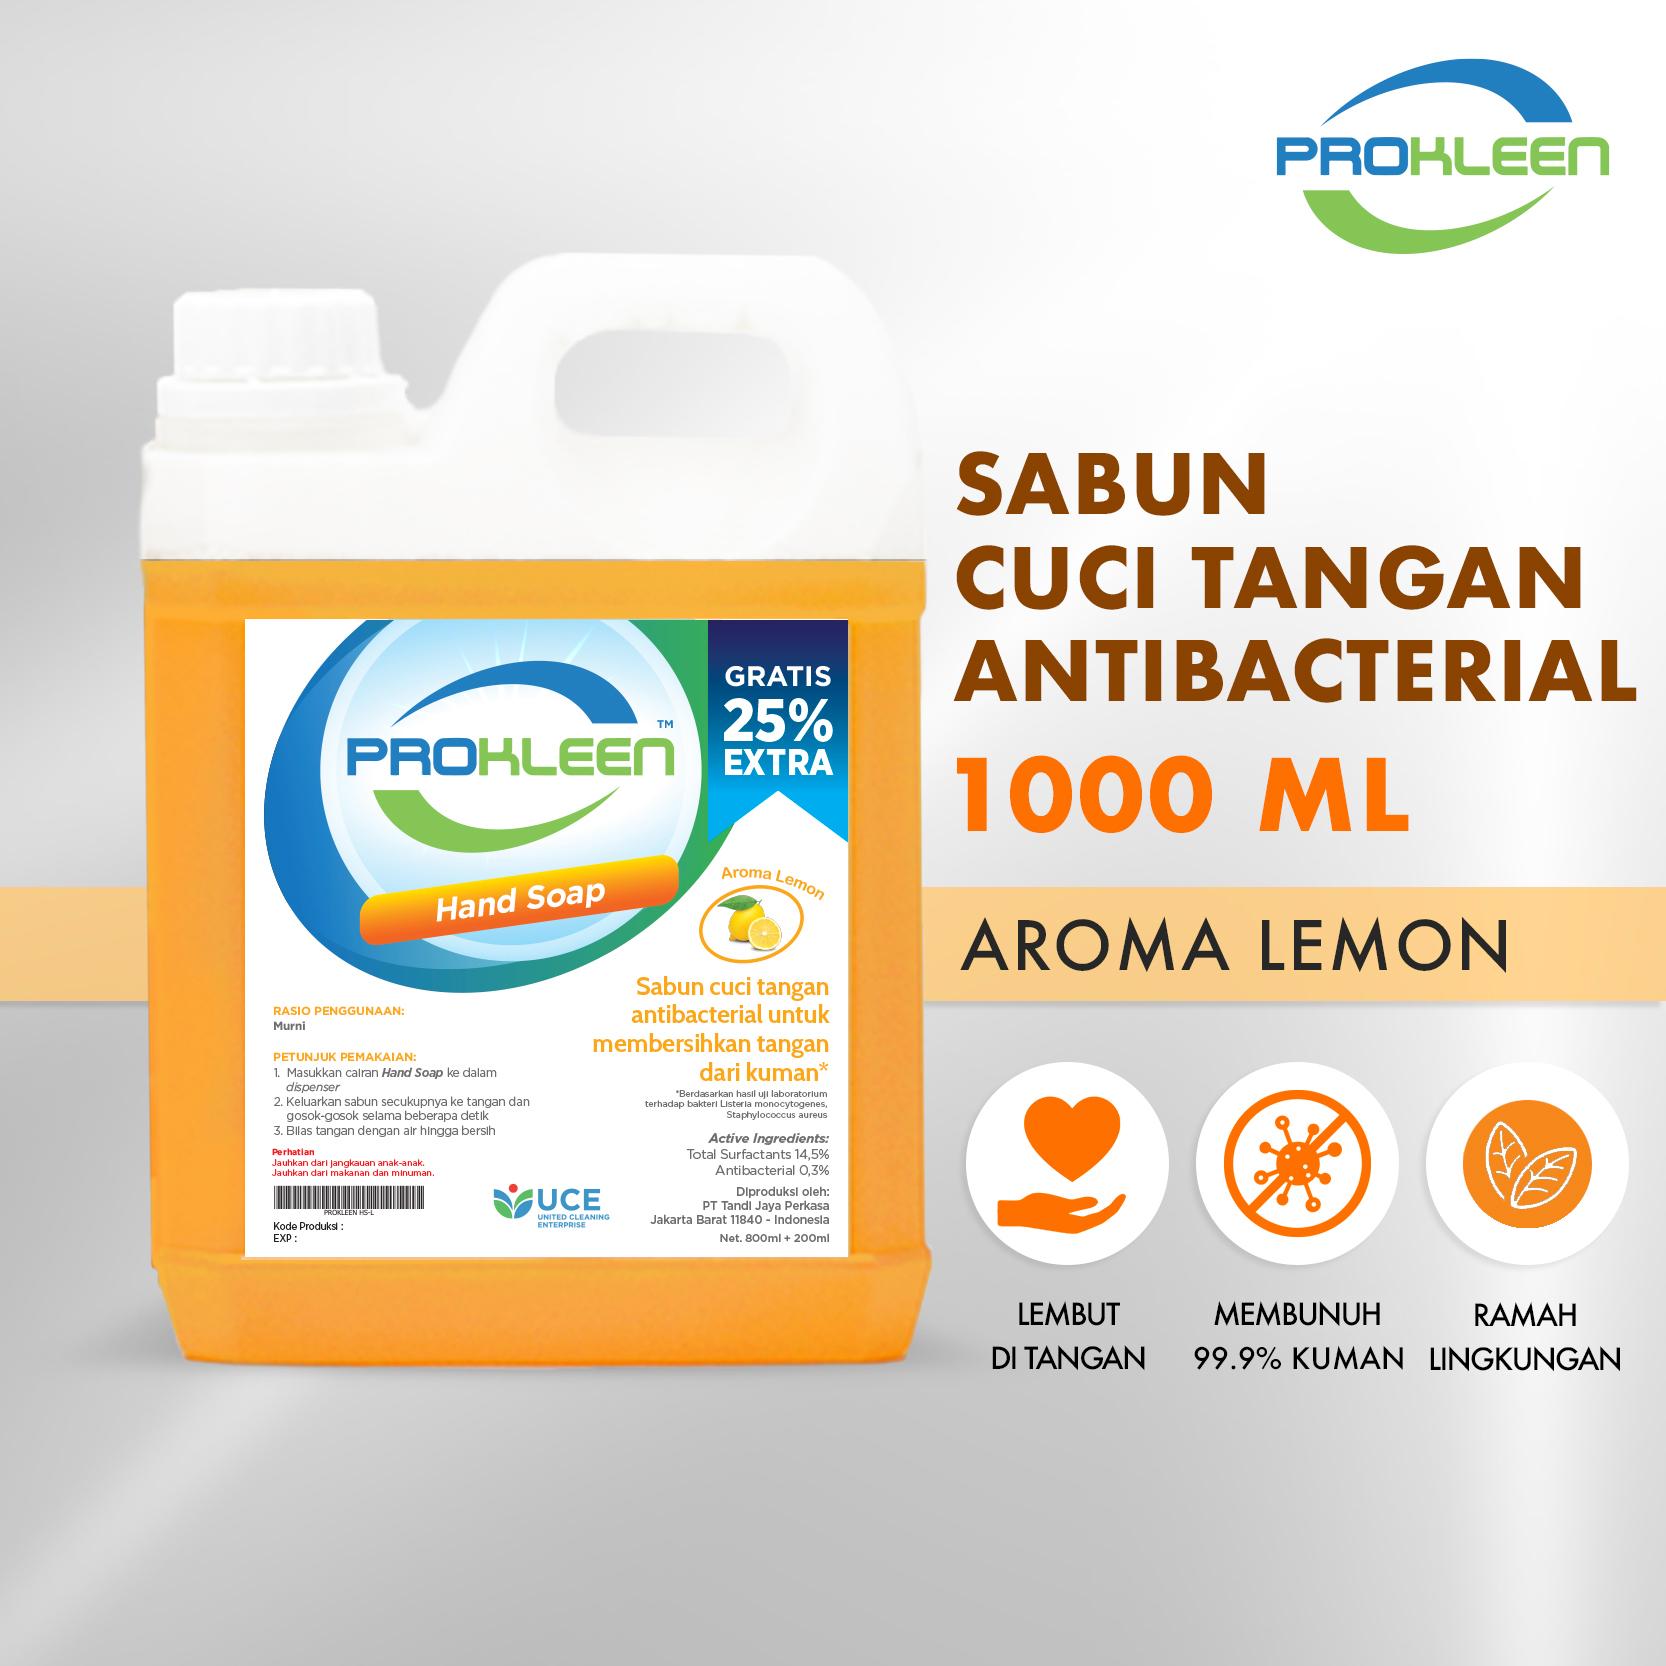 Sabun Cuci Tangan HAND SOAP PROKLEEN 1000mL